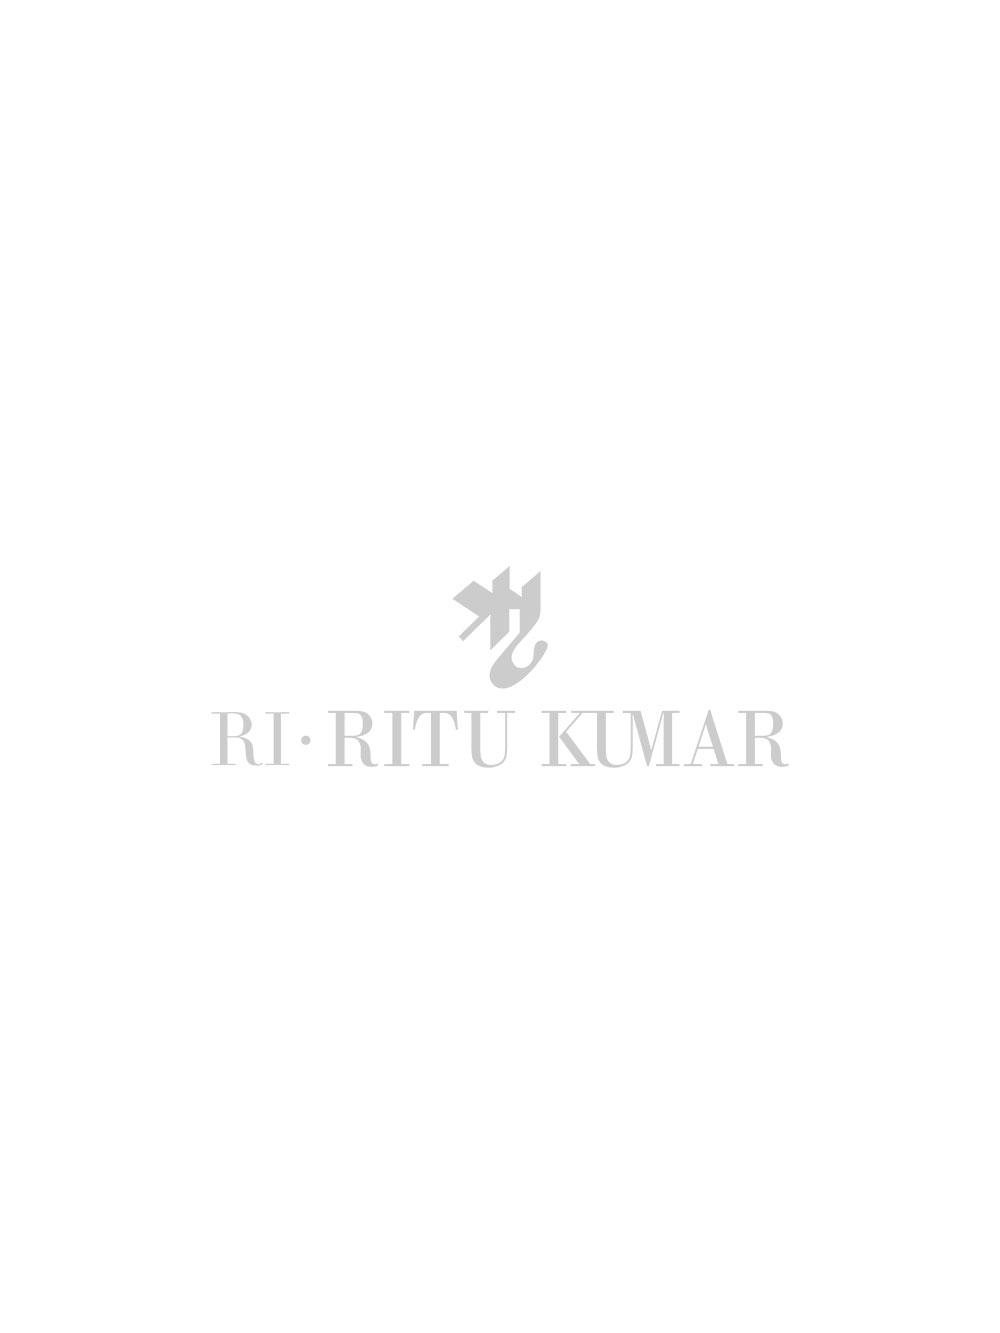 Beige & Indigo Embroidered Kurta With Stitched Blouse